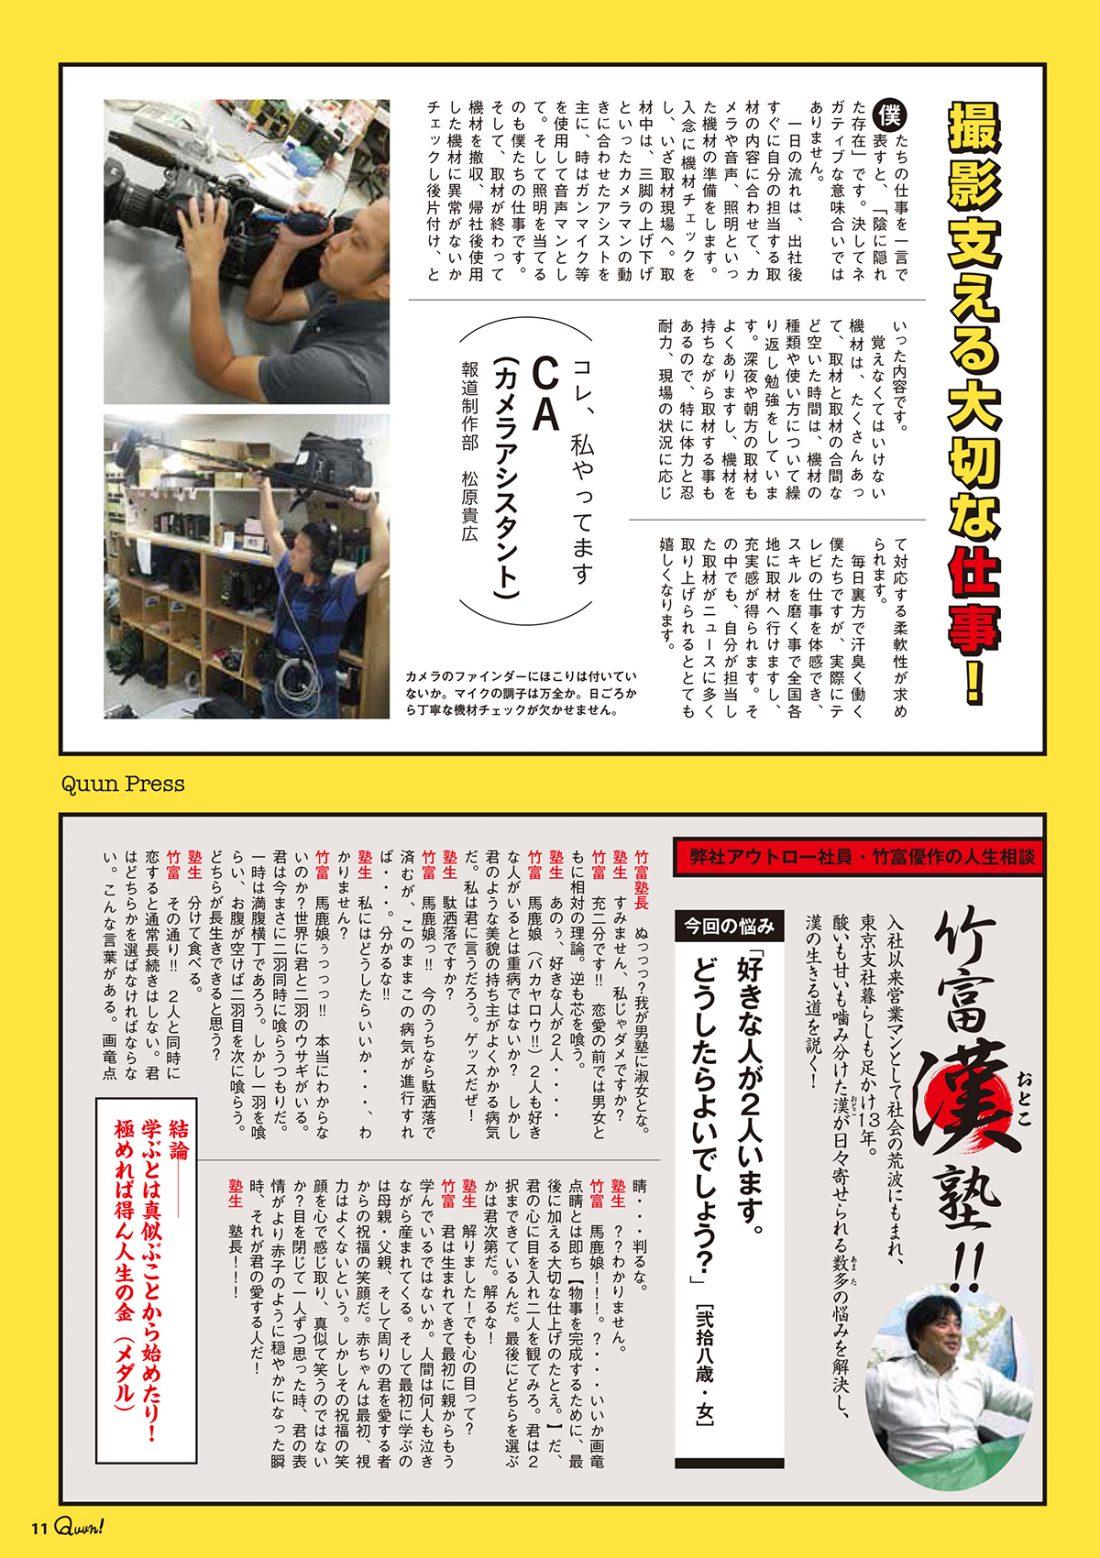 https://www.qab.co.jp/qgoro/wp-content/uploads/quun_0613-1100x1558.jpg